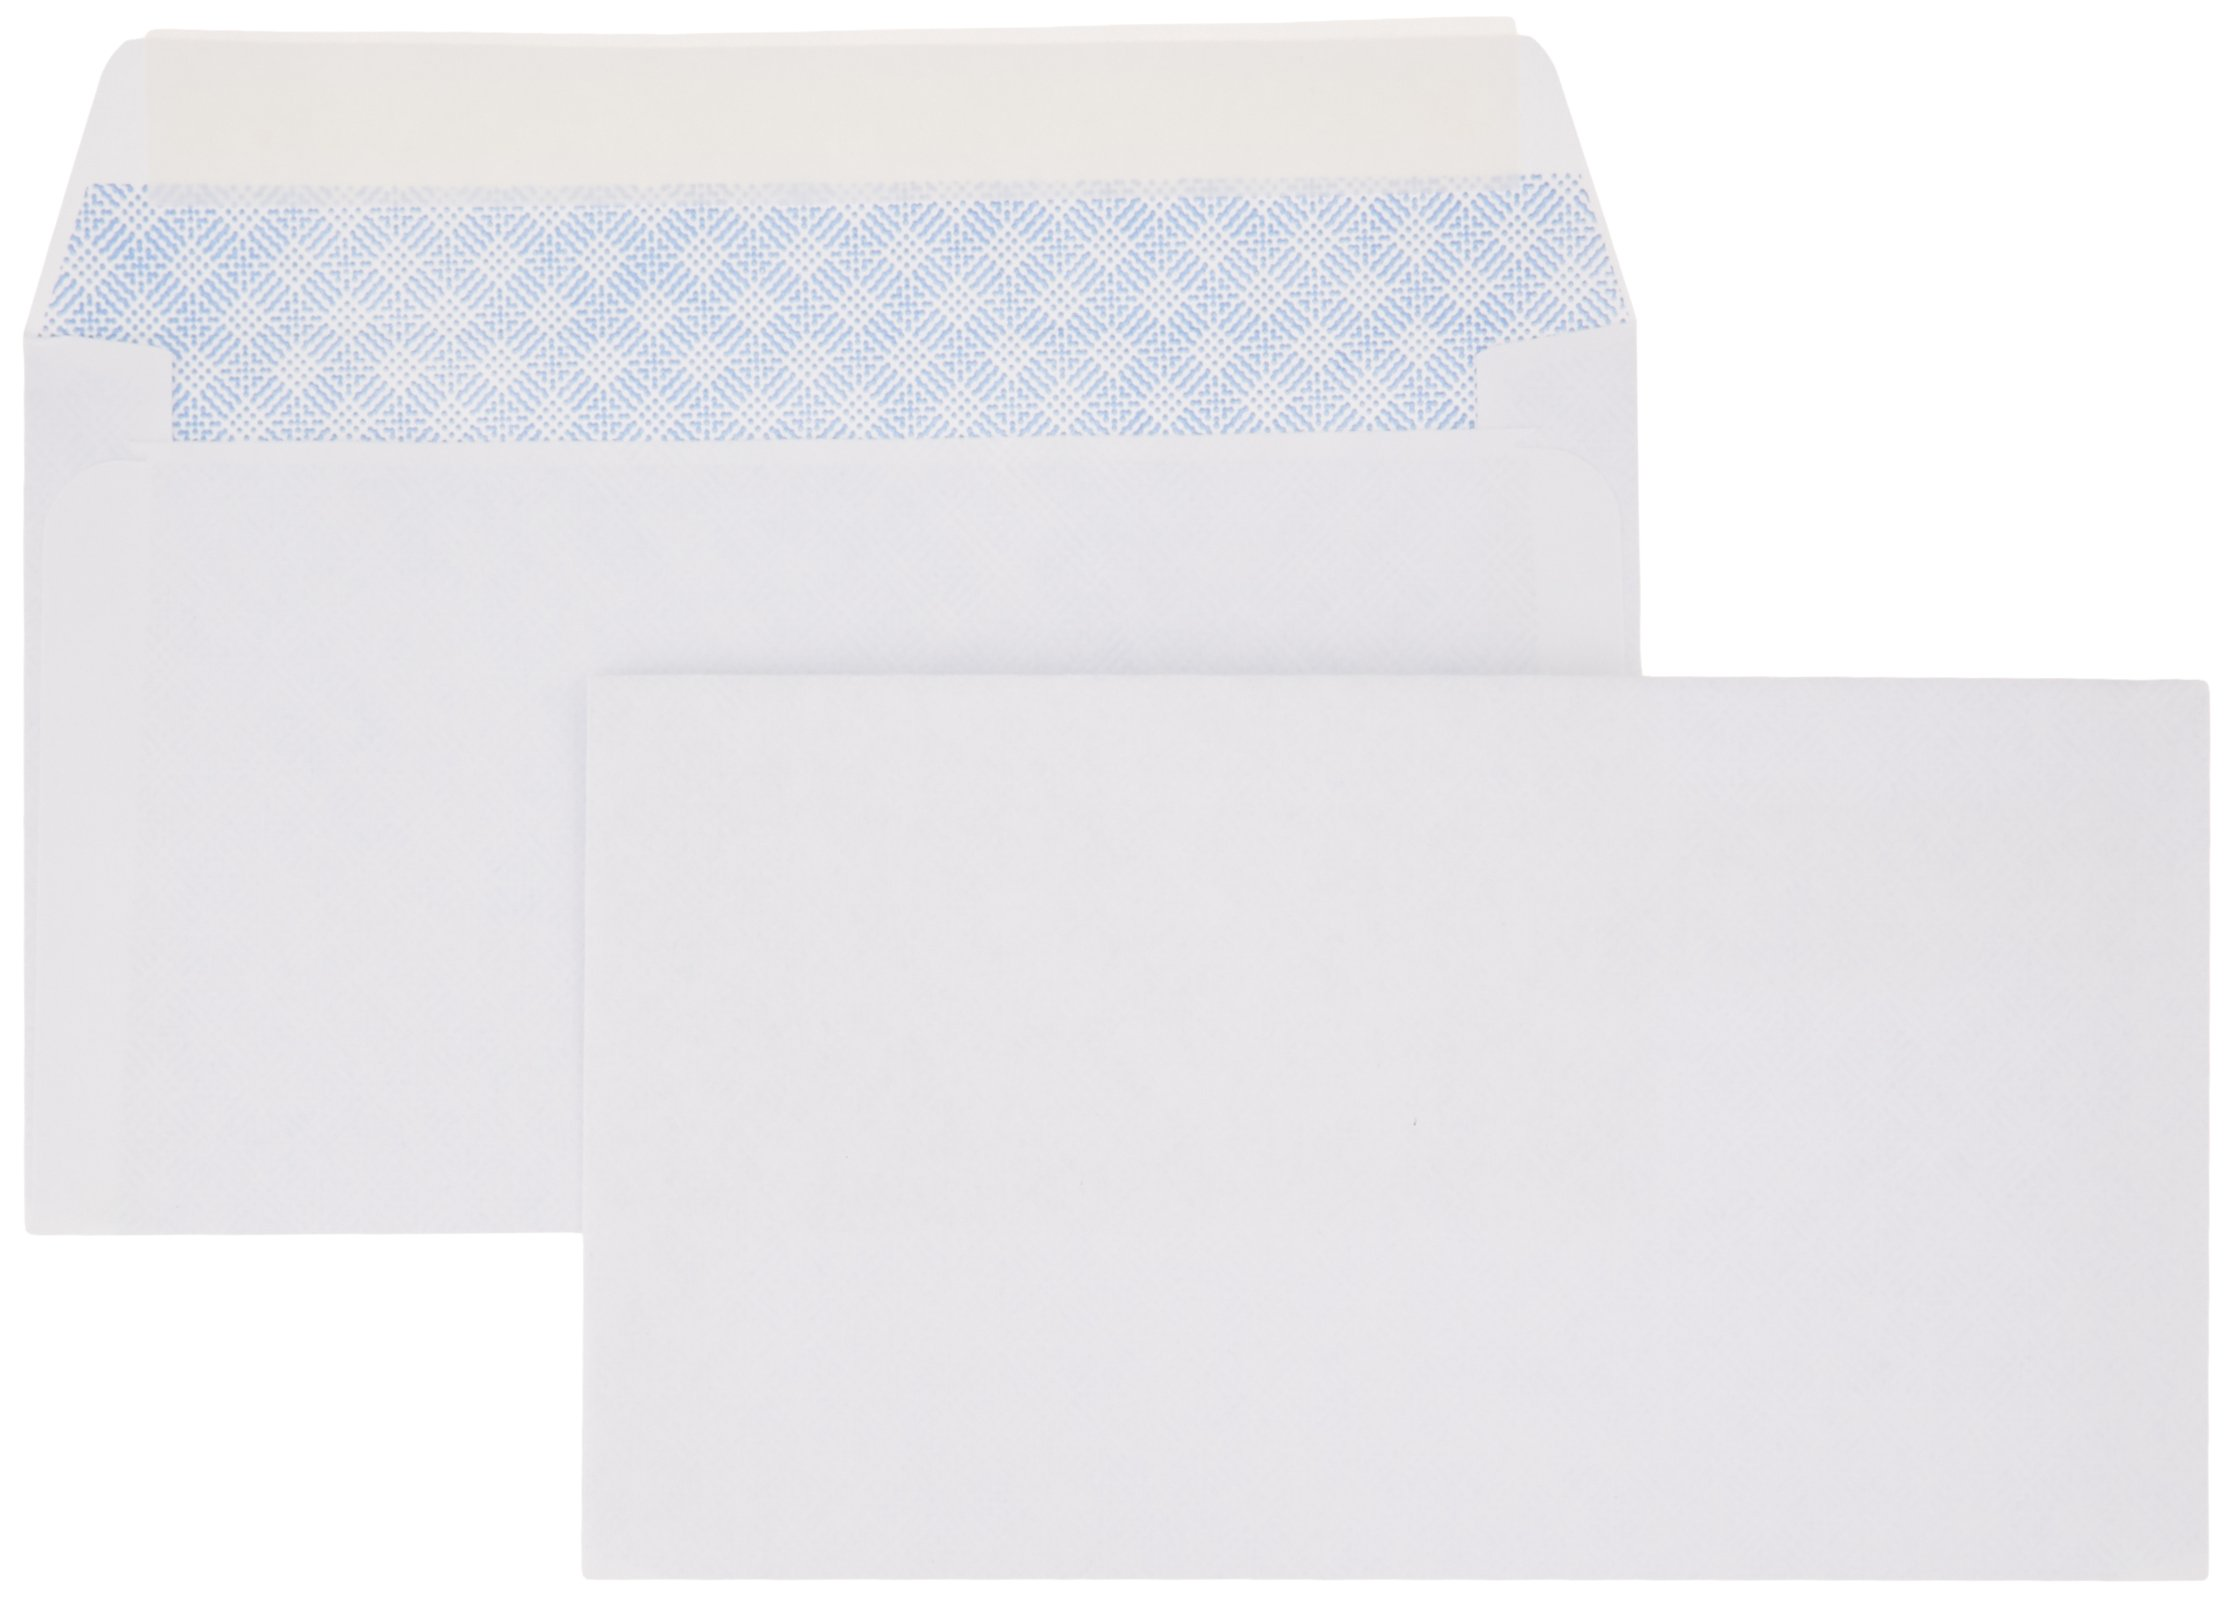 AmazonBasics #6 3/4 Security-Tinted Envelope, Peel & Seal, 100-Pack